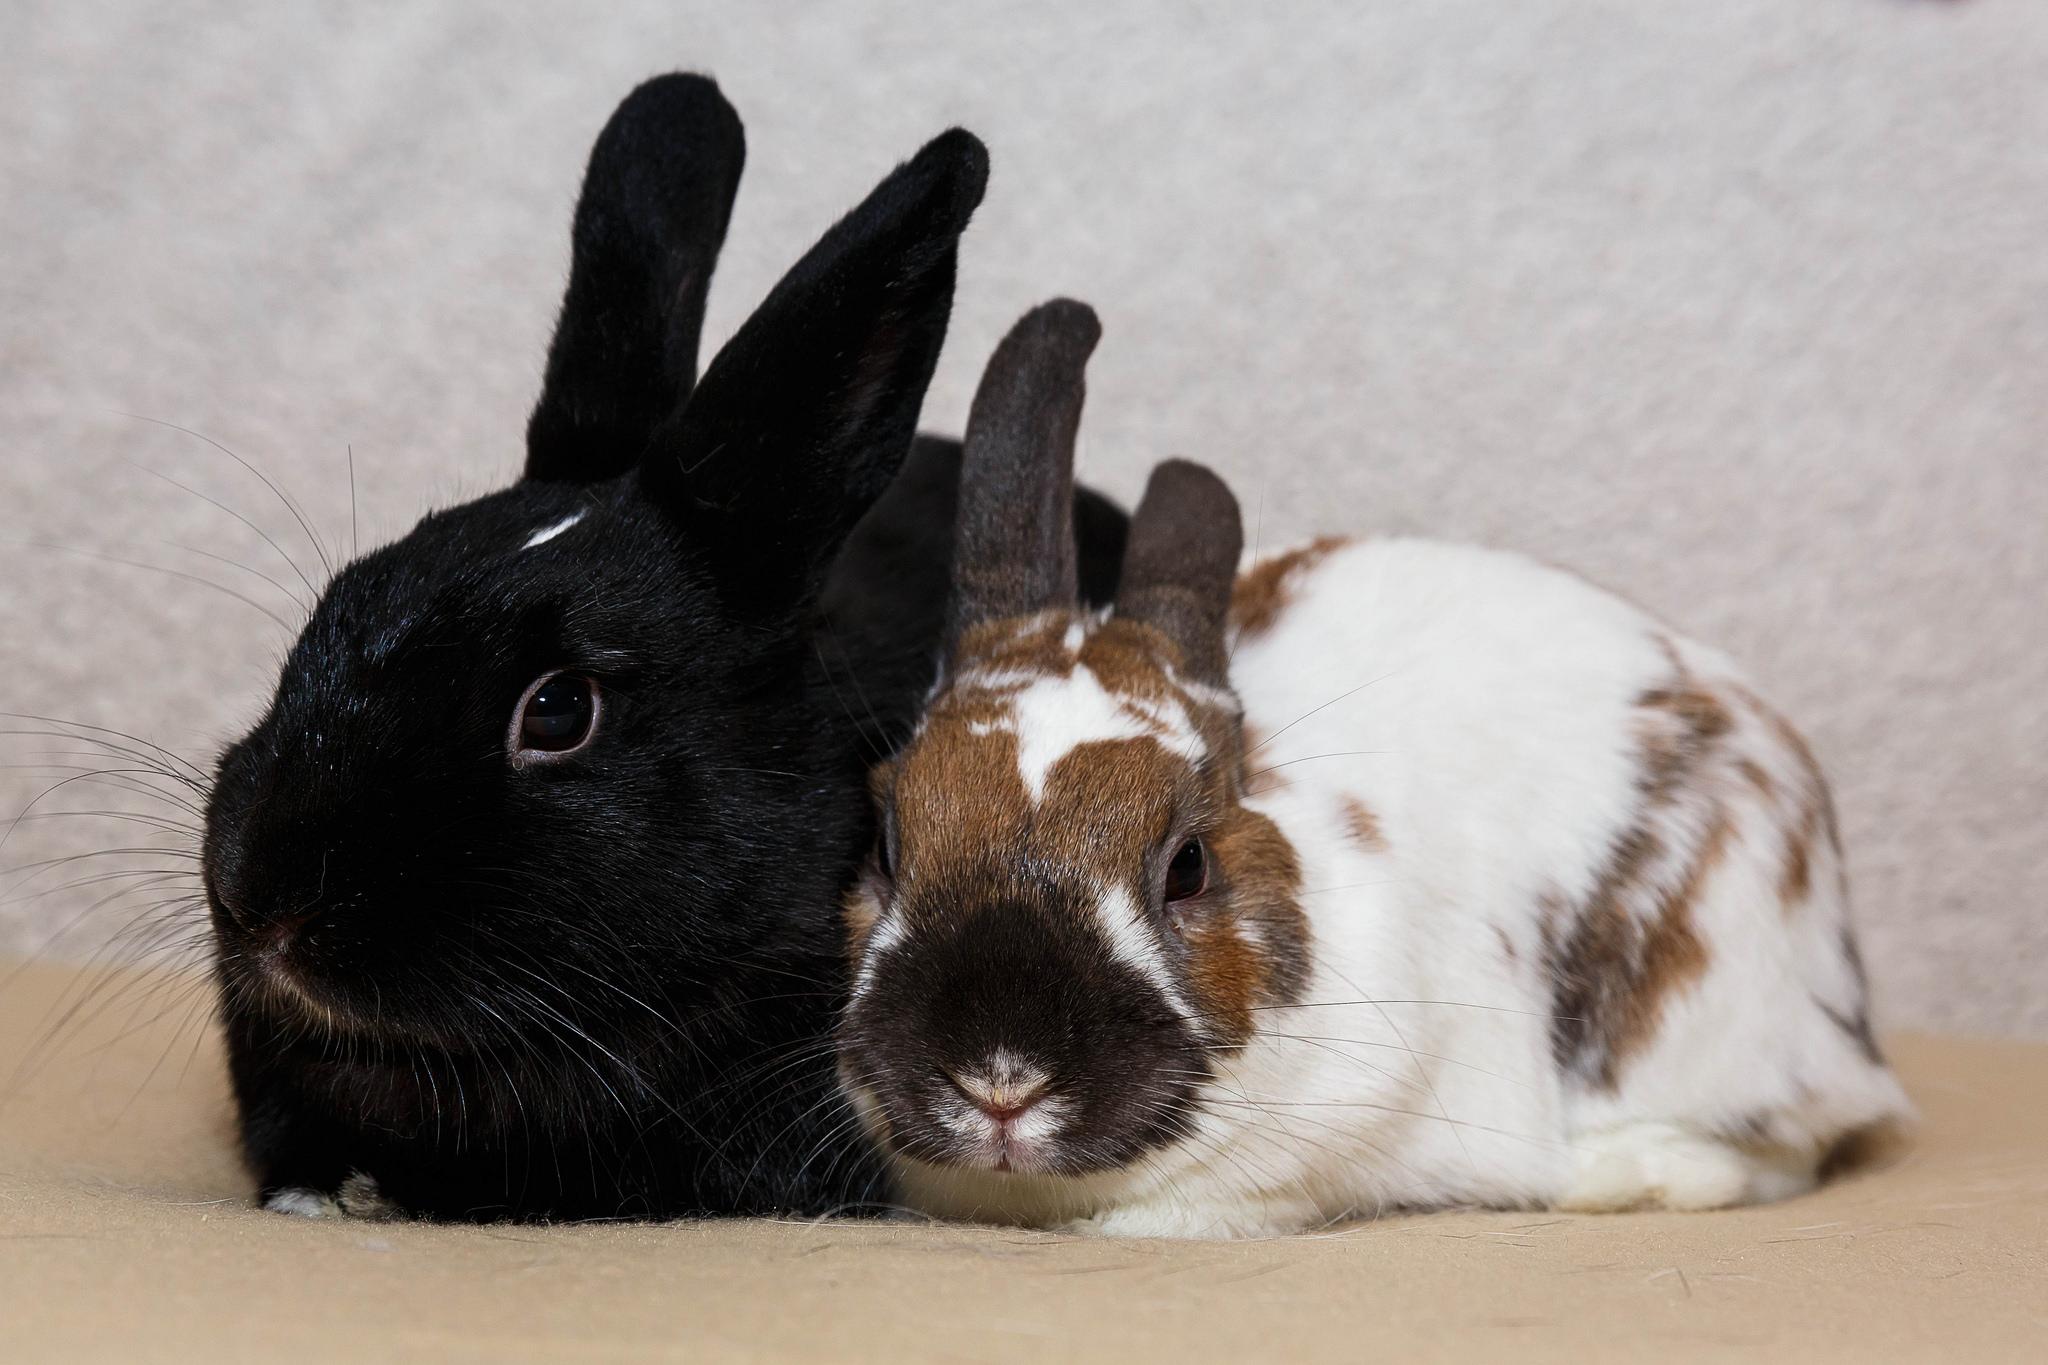 Gumdrop and Mr Bunny